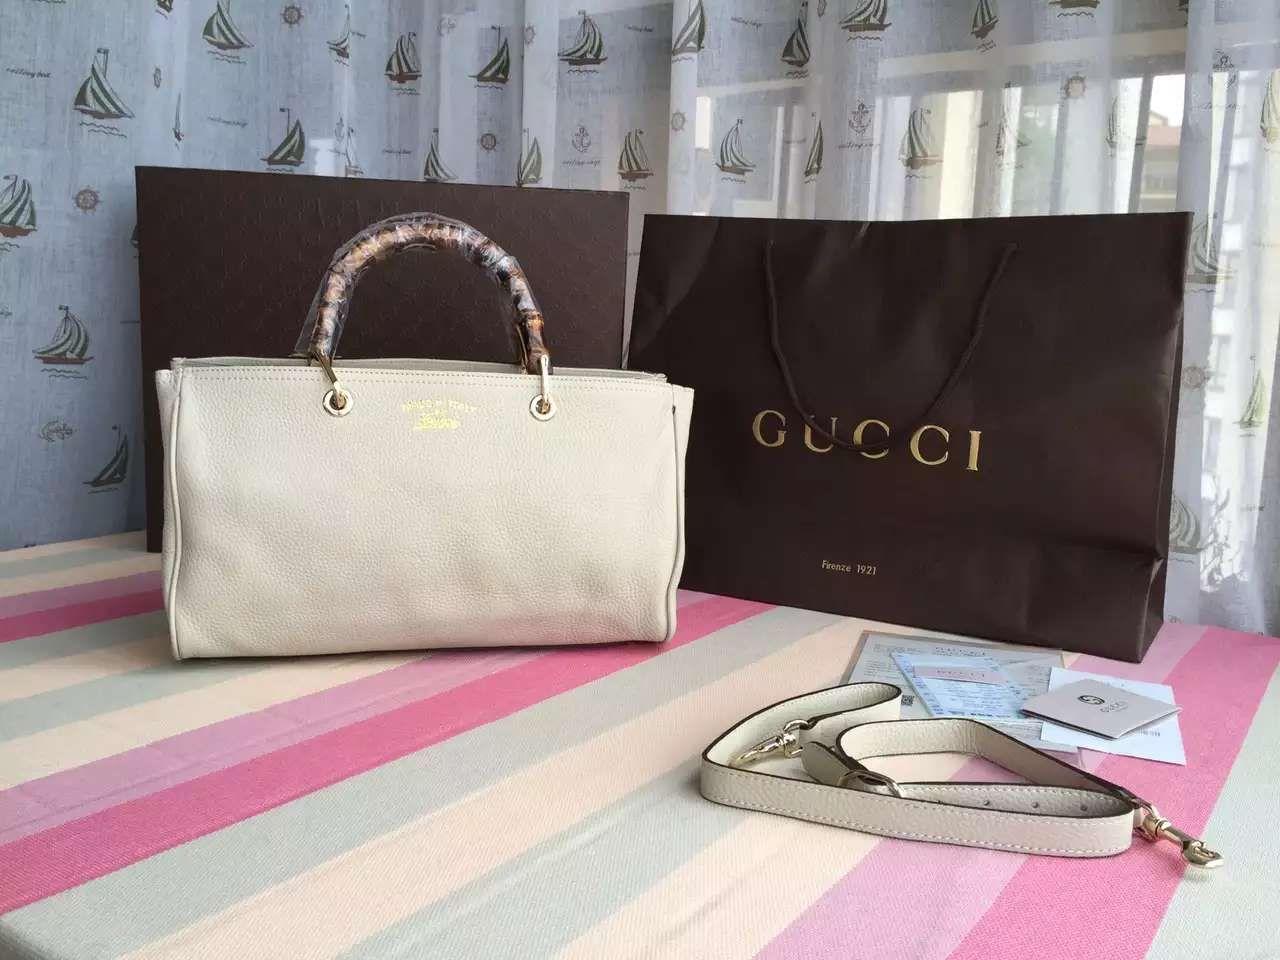 gucci Bag, ID : 23274(FORSALE:a@yybags.com), gucci usa online store, gucci jansport bags, site da gucci, gucci handbag handles, gucci mens wallets sale, gucci full site, gucci glasgow, gucci black leather briefcase, gucci house, gucci children's backpacks, gucci internal frame backpack, gucci attache case, gucci preschool backpacks #gucciBag #gucci #gucci #retail #stores